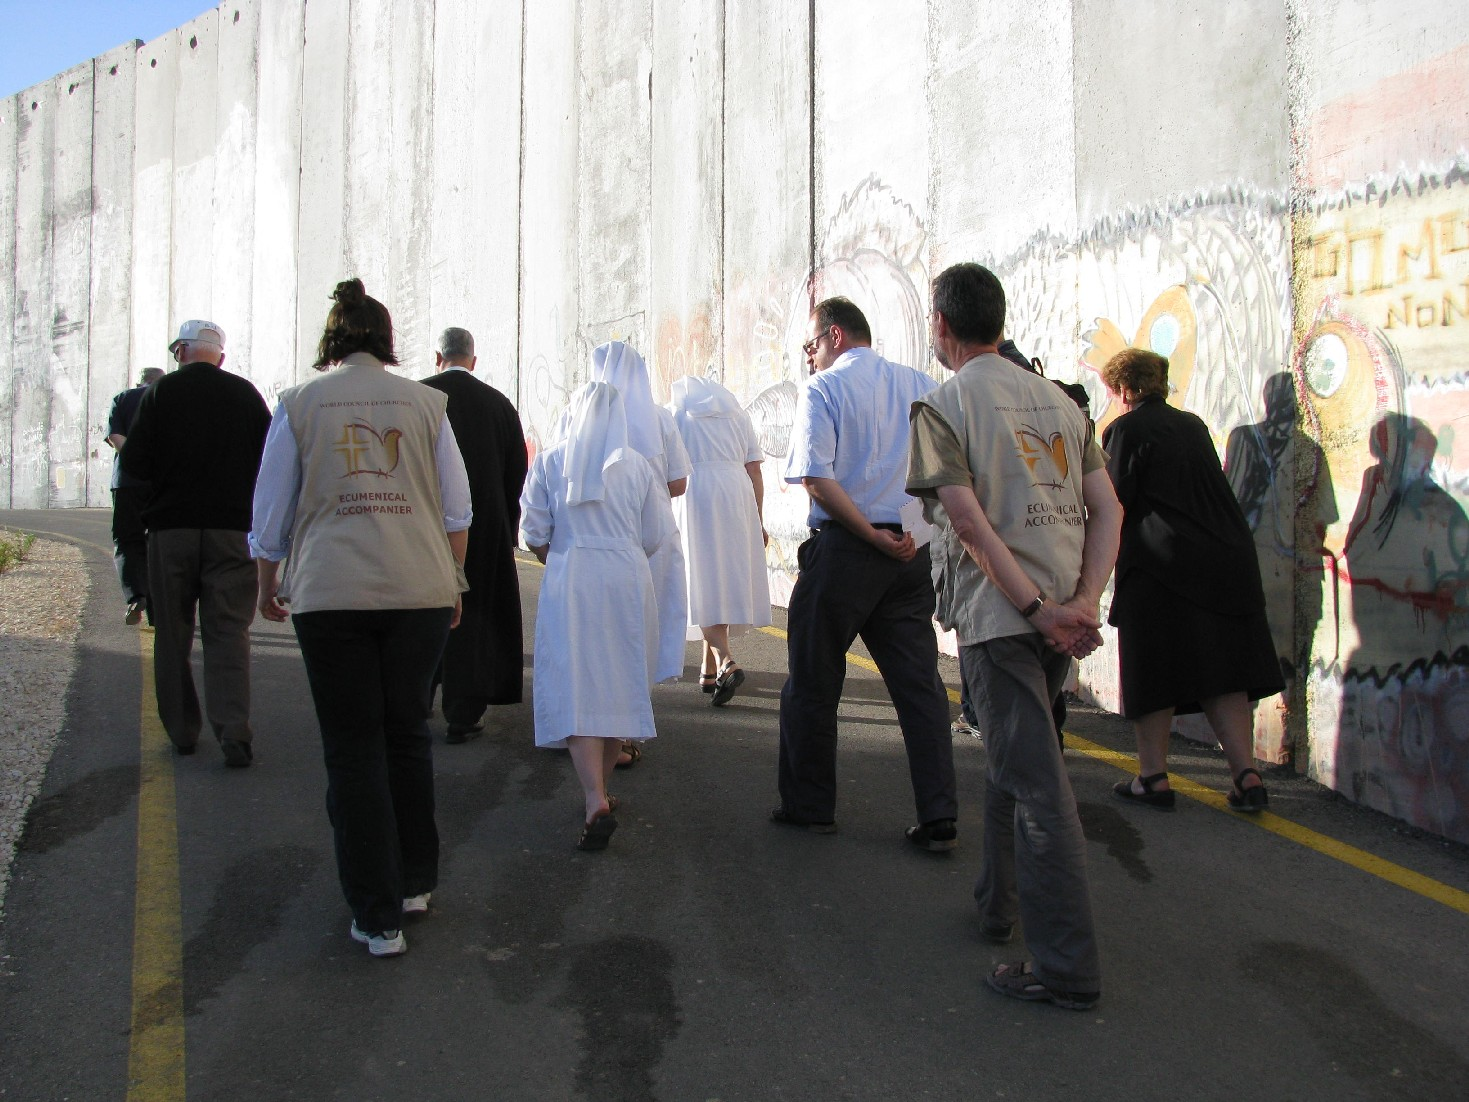 Gebet an der Mauer in Betlehem (Foto: Kate Taber)